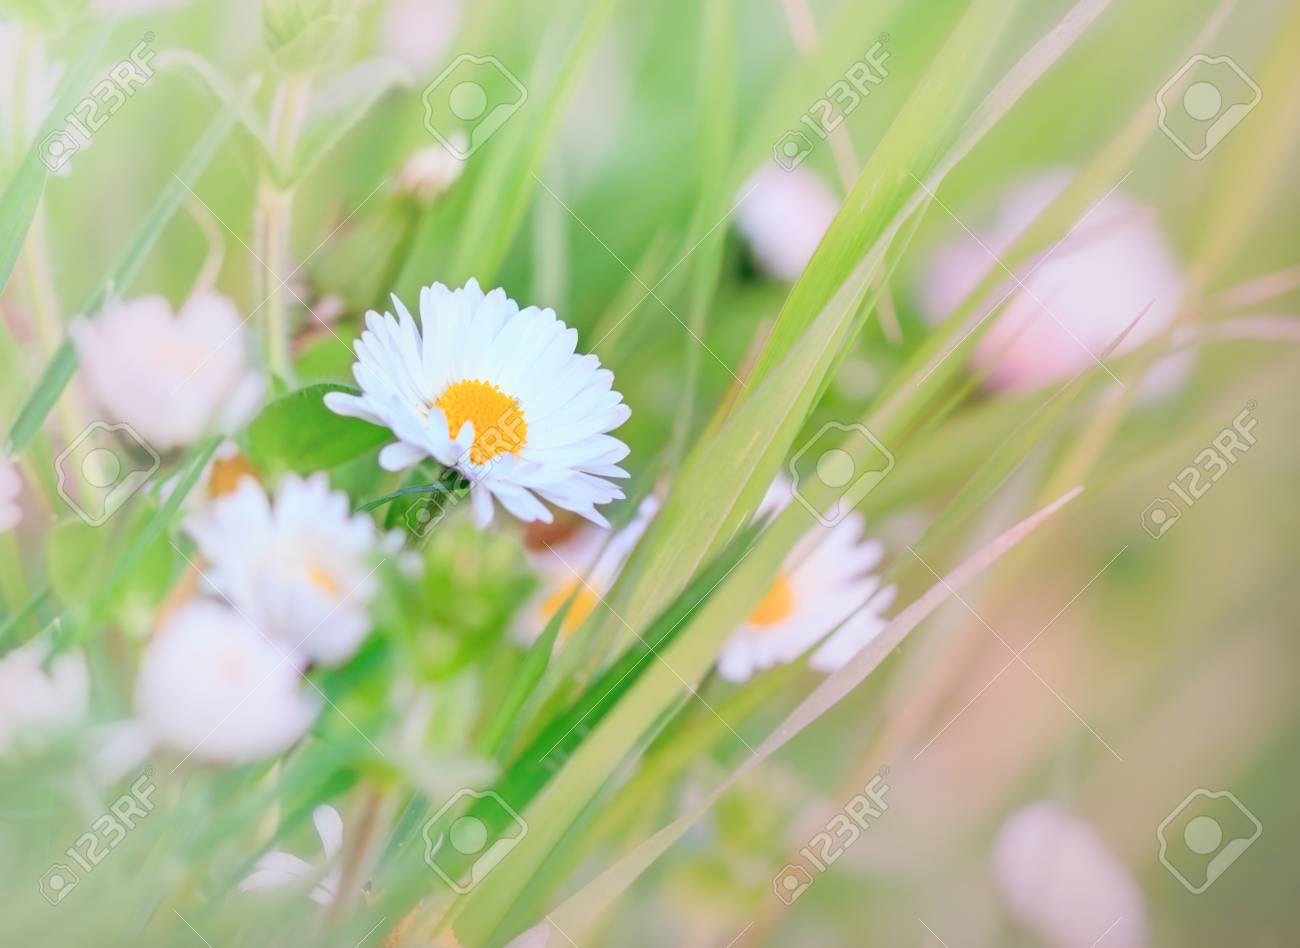 Beautiful daisy flowers in meadow stock photo picture and royalty beautiful daisy flowers in meadow stock photo 45693575 izmirmasajfo Choice Image